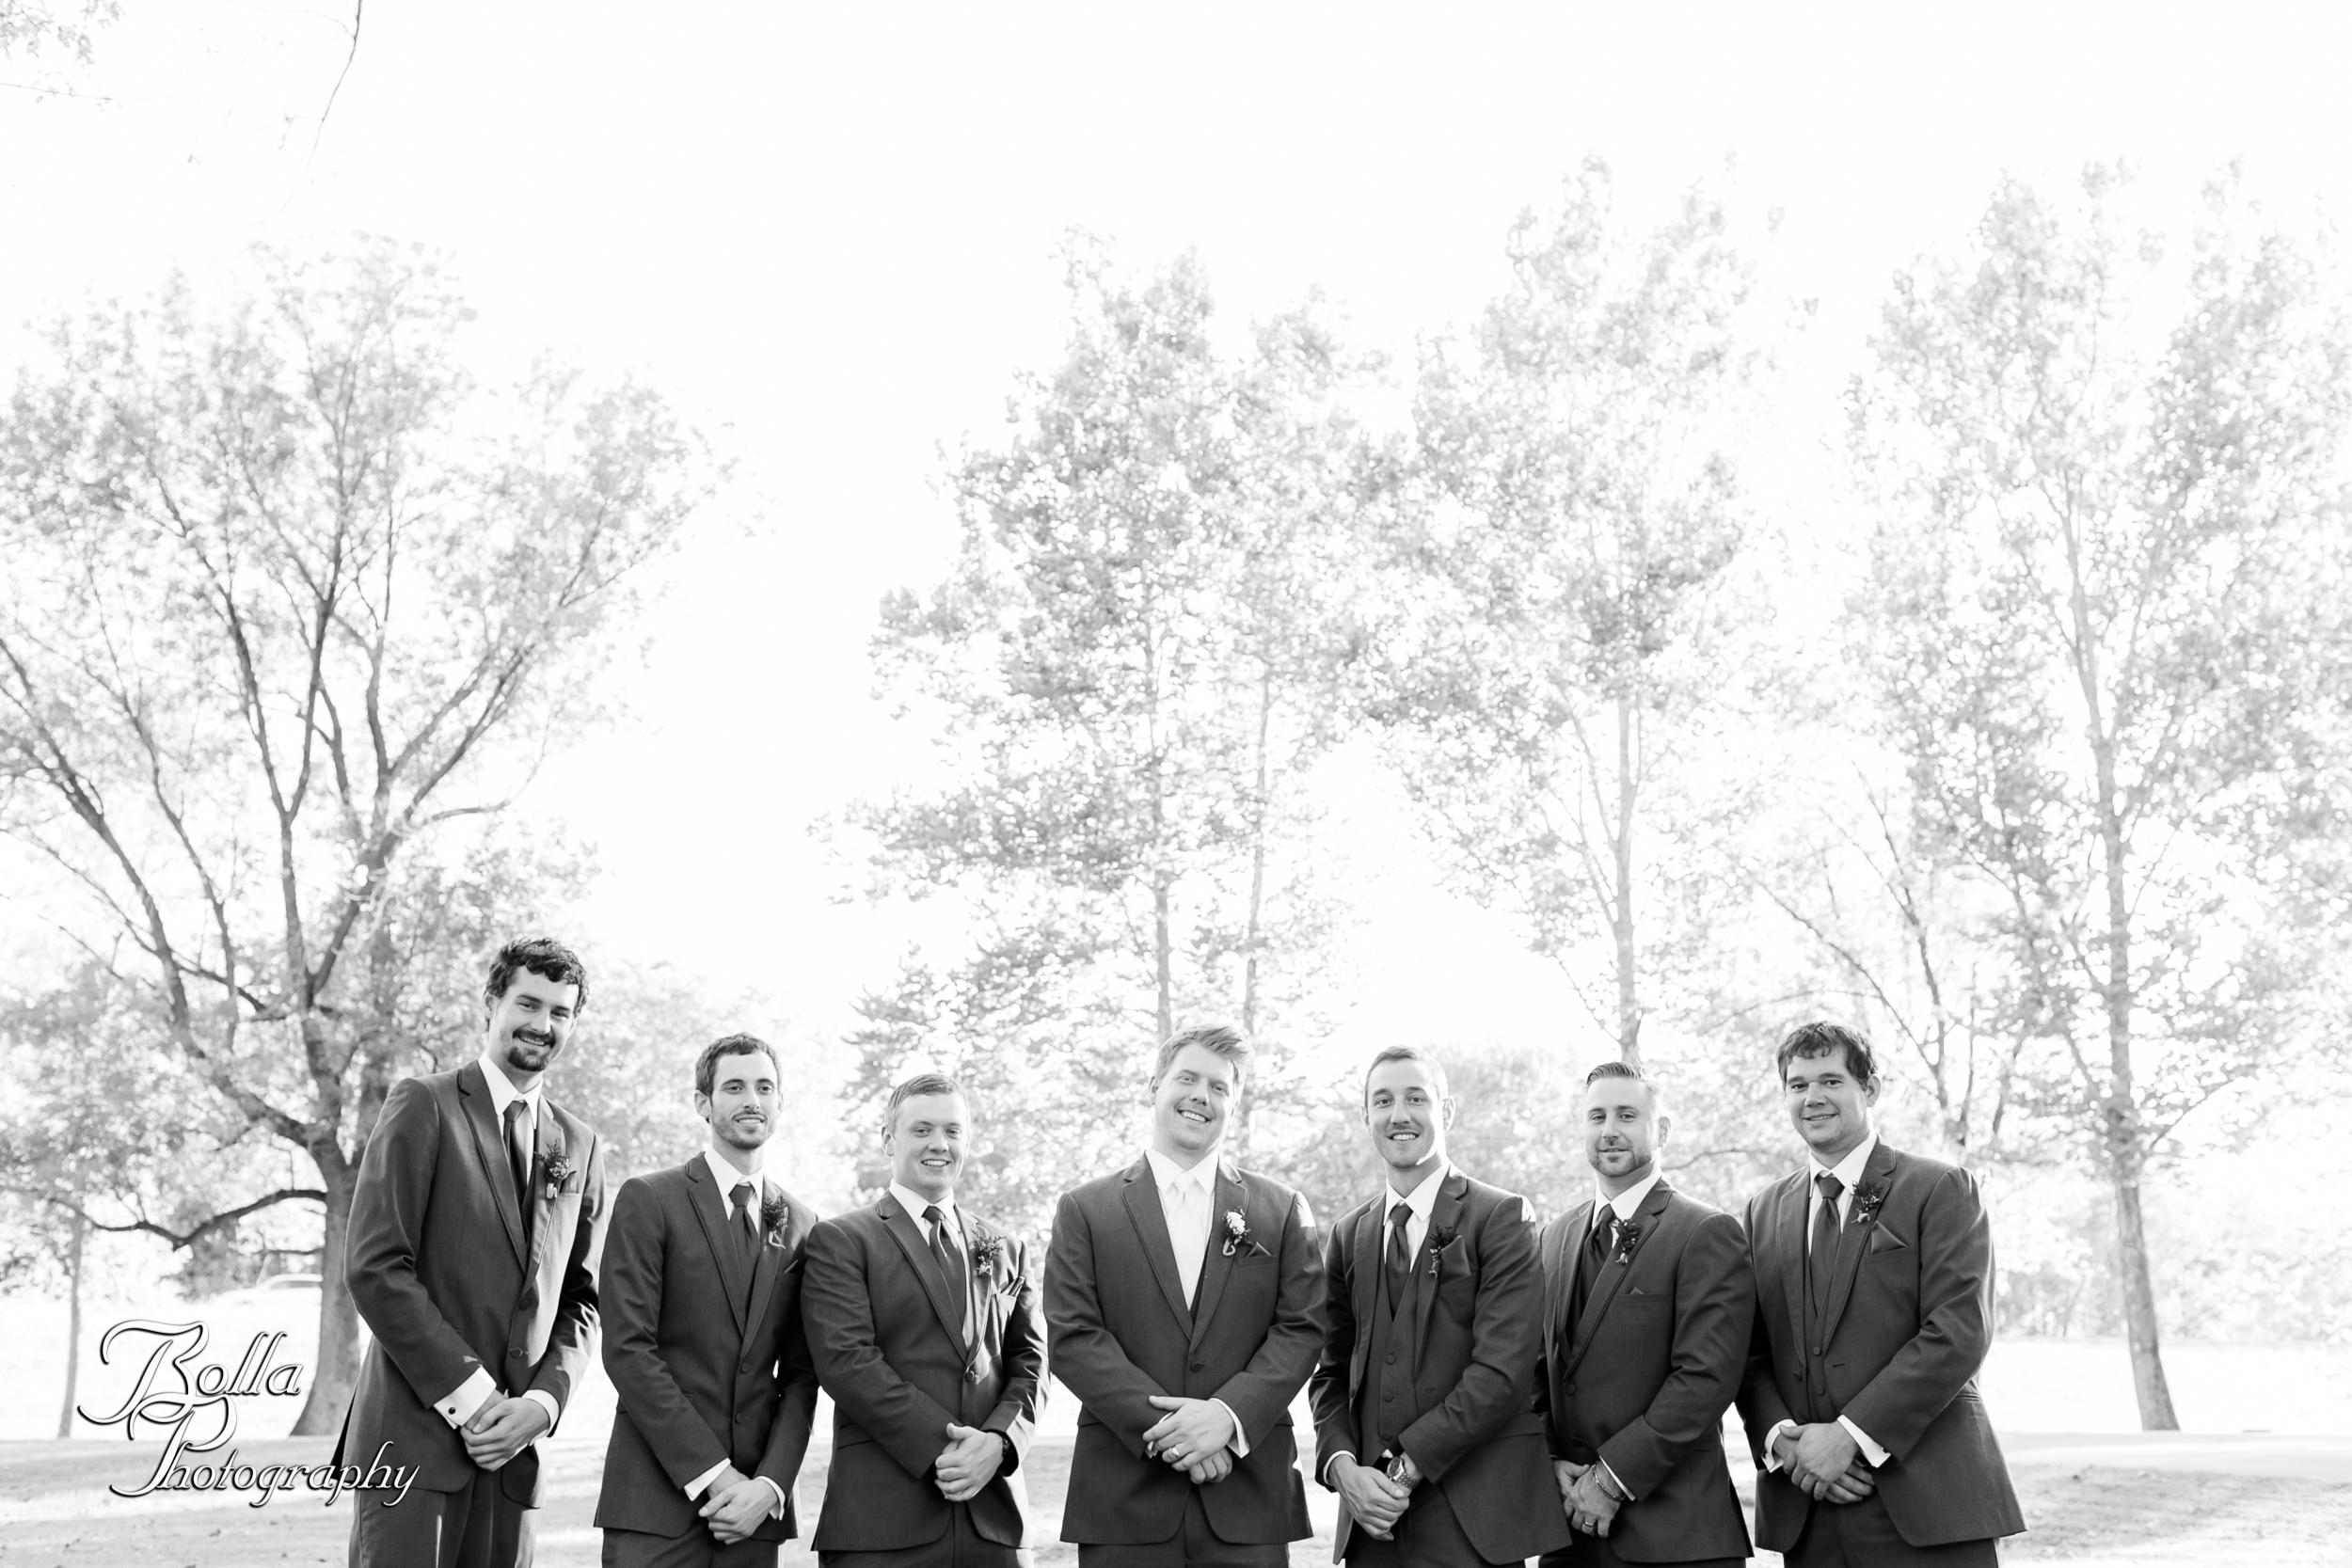 Bolla_photography_edwardsville_wedding_photographer_st_louis_weddings_Reilmann-0403.jpg